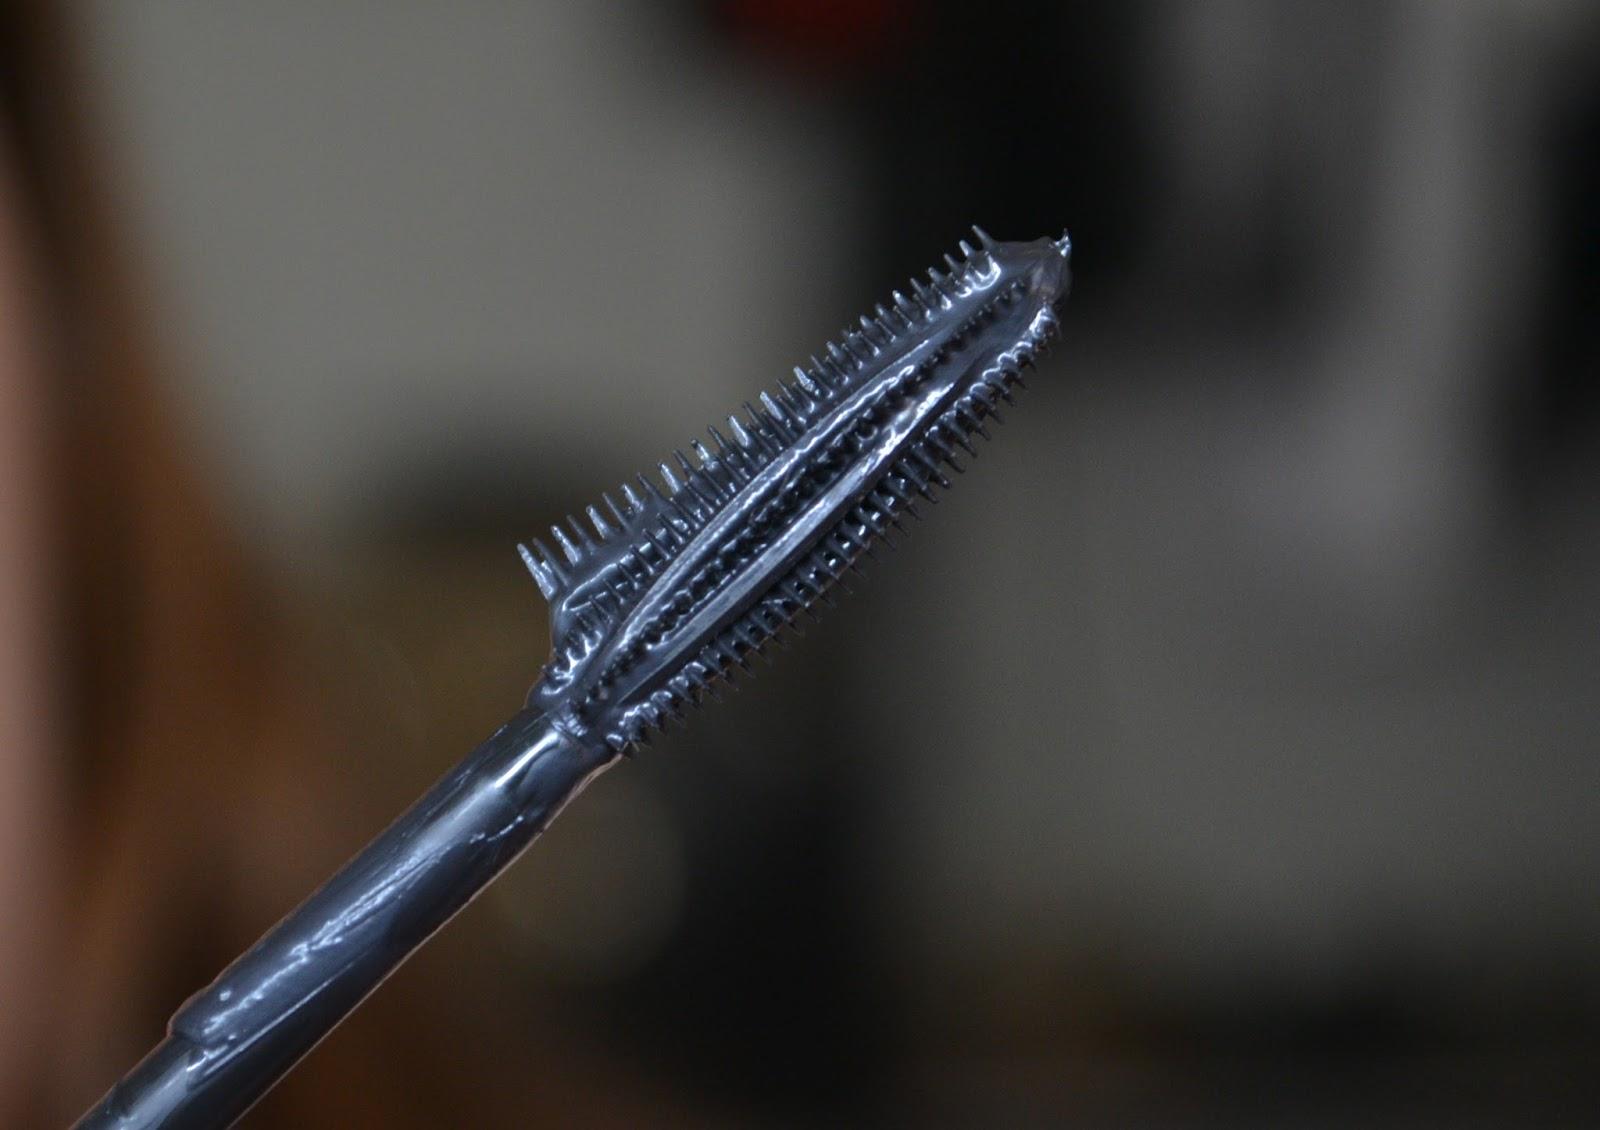 false lash wing mascara wand